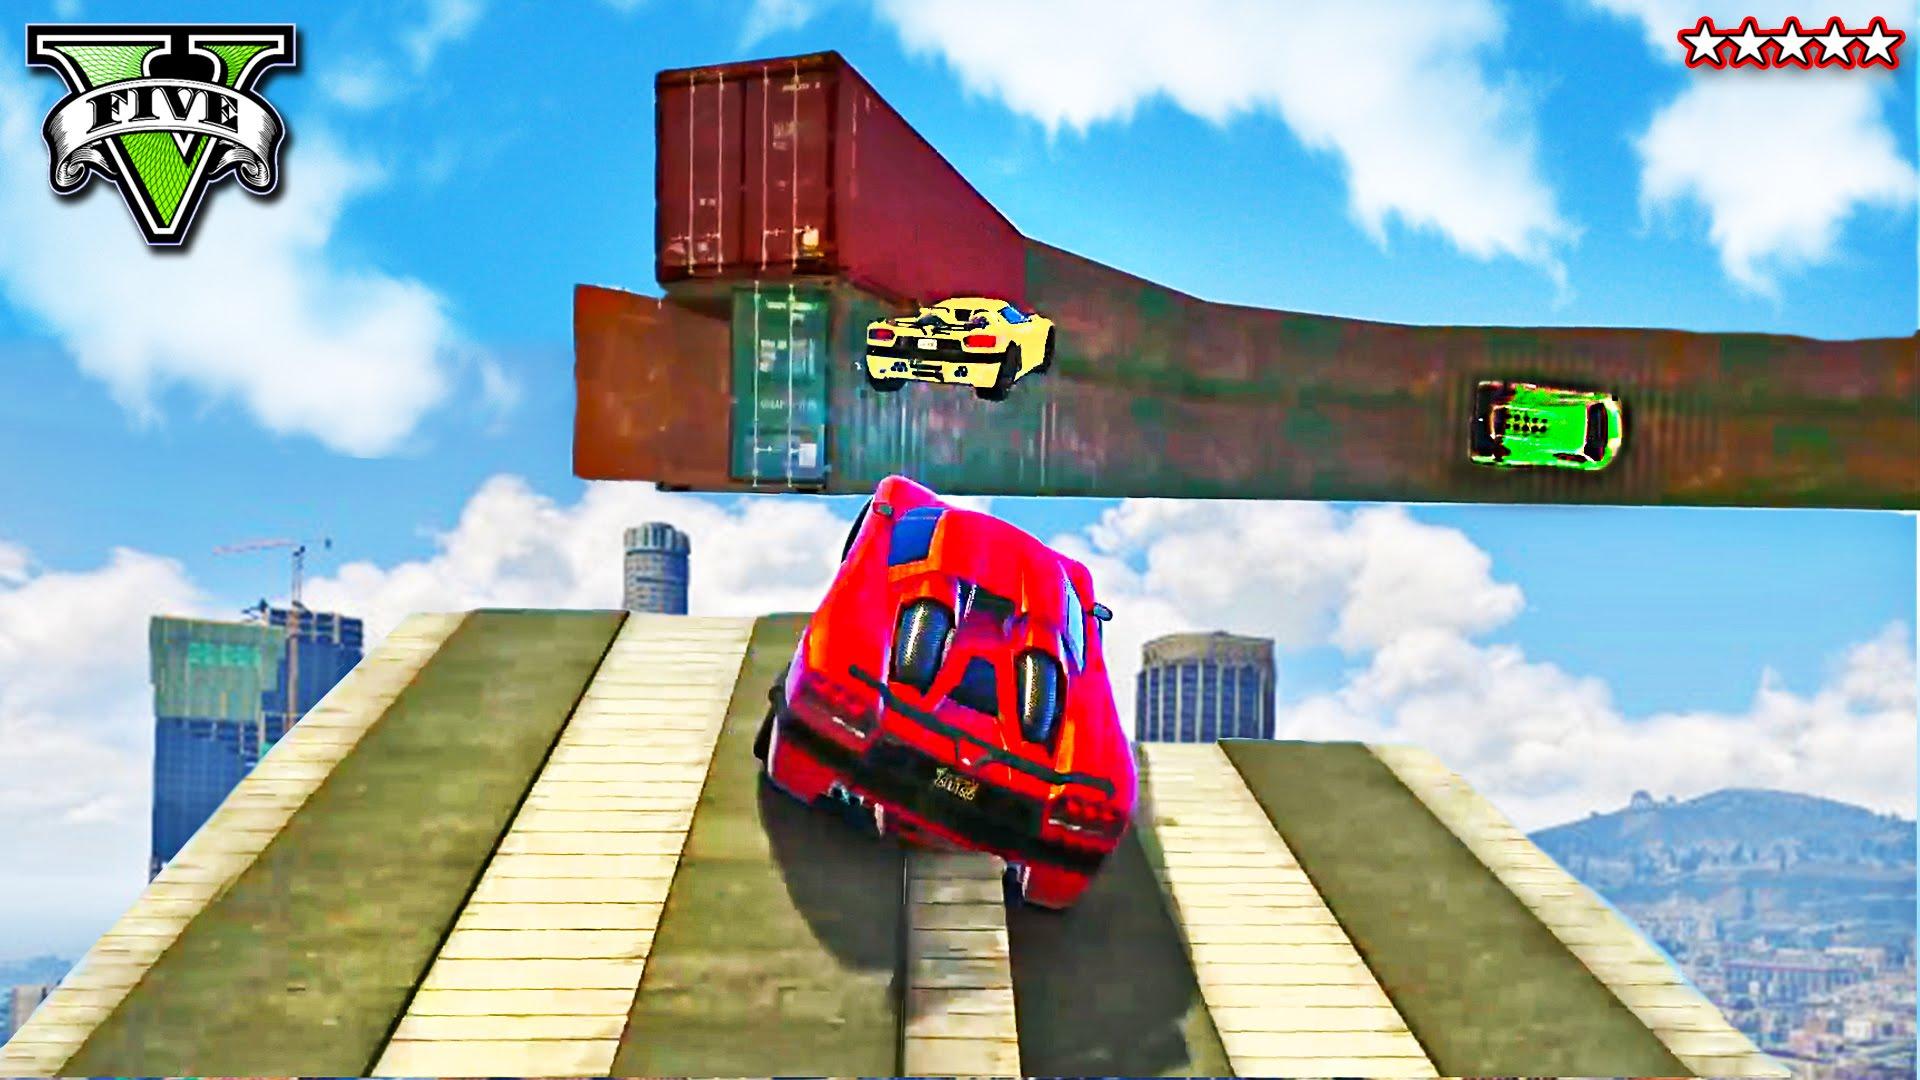 GTA 5 Stunt Races | WALLRIDE CIRCLE OF HELL! Extreme Daredevil Racing ...